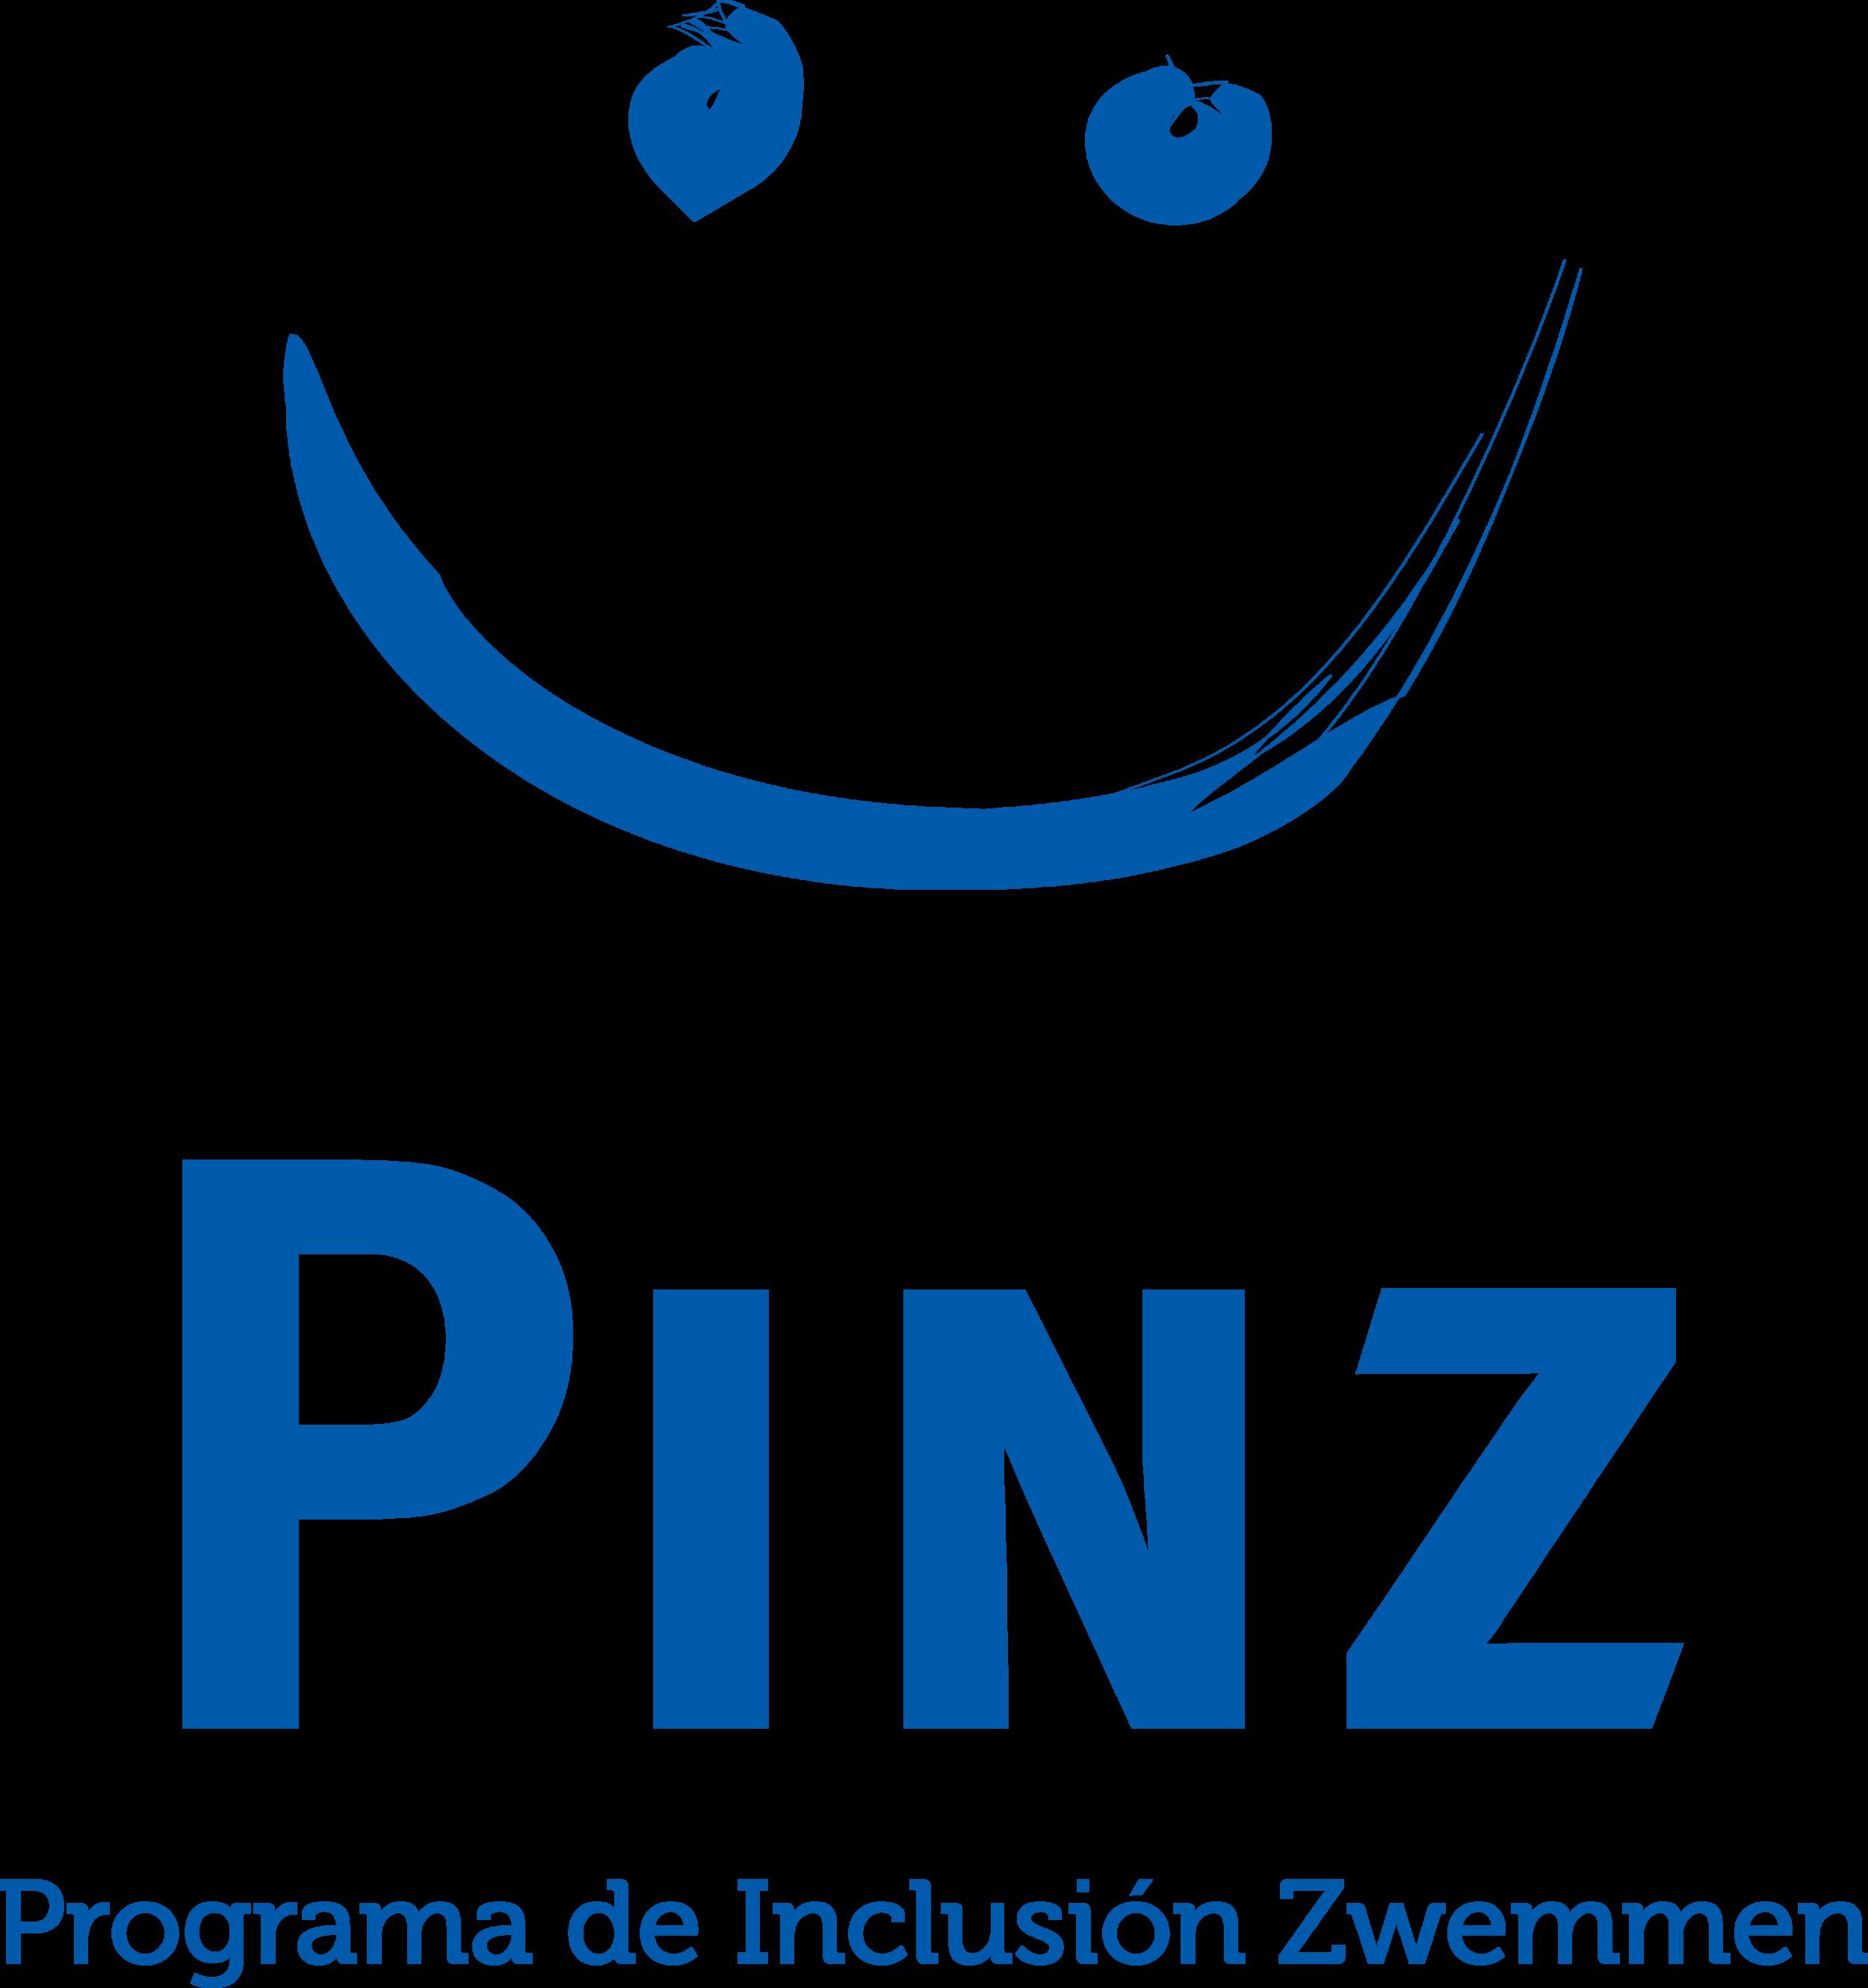 PINZ C.png